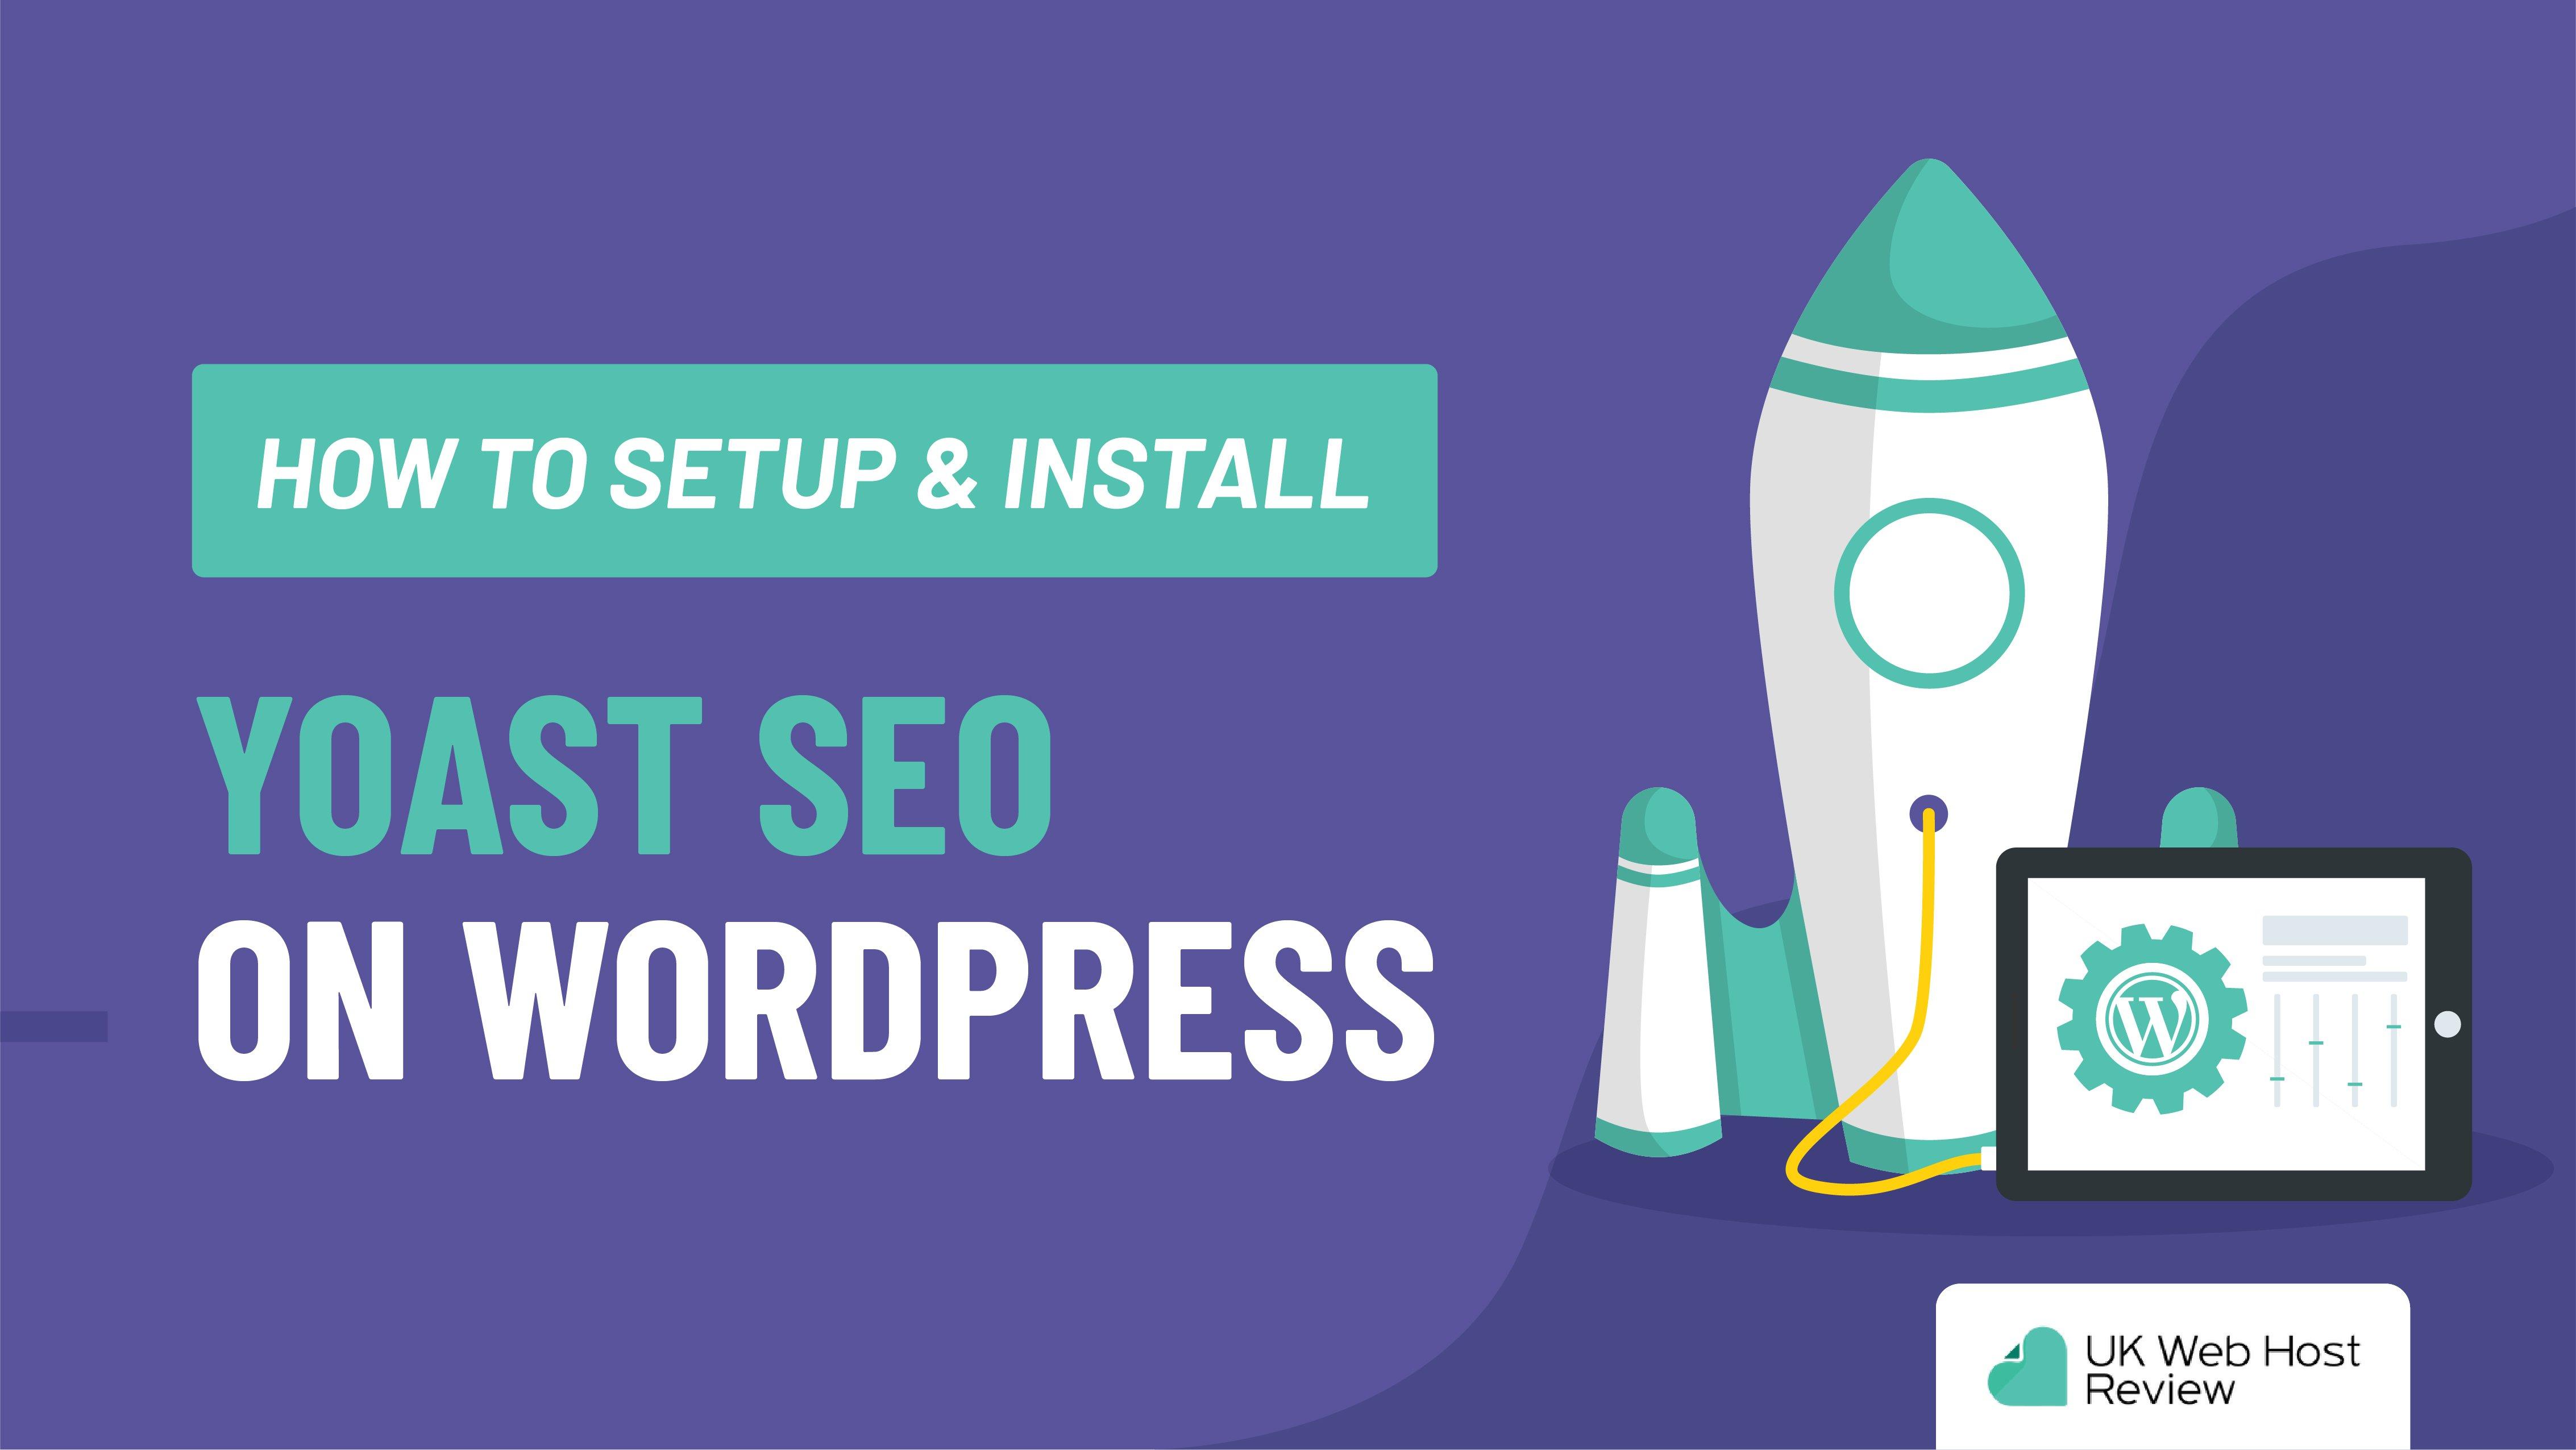 How to Setup & Install Yoast SEO on WordPress